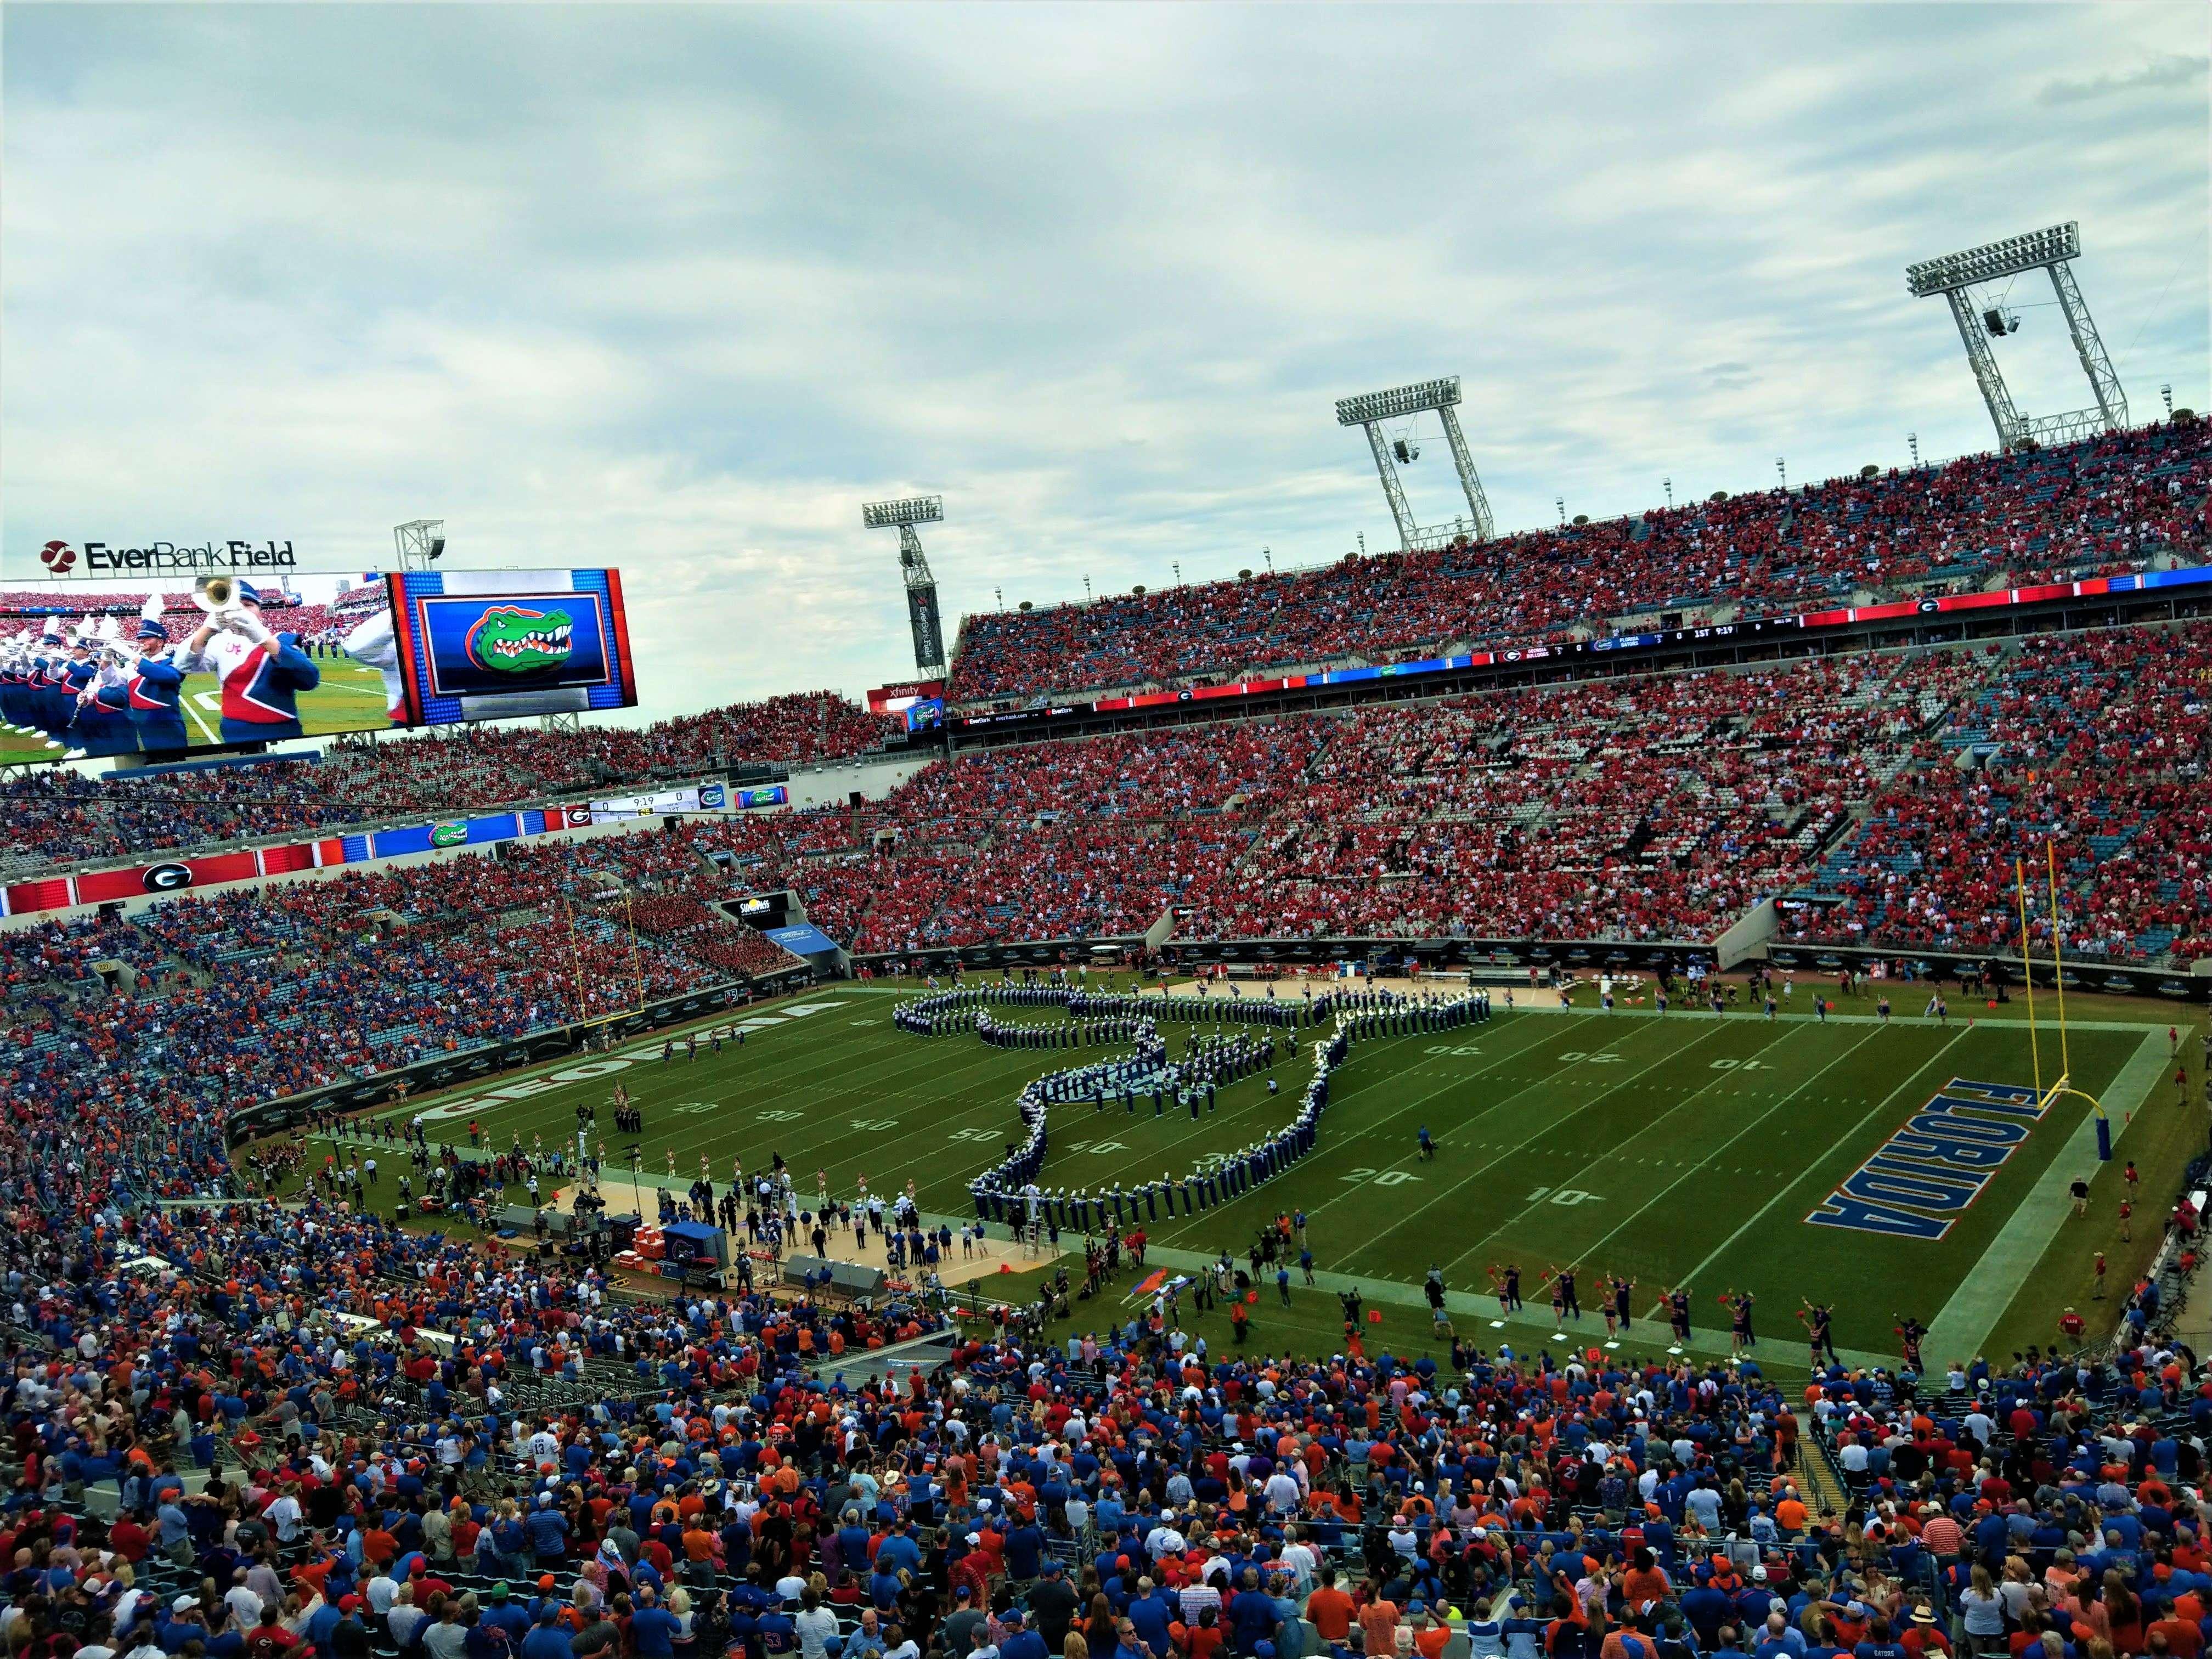 Florida-Georgia game in Jacksonville